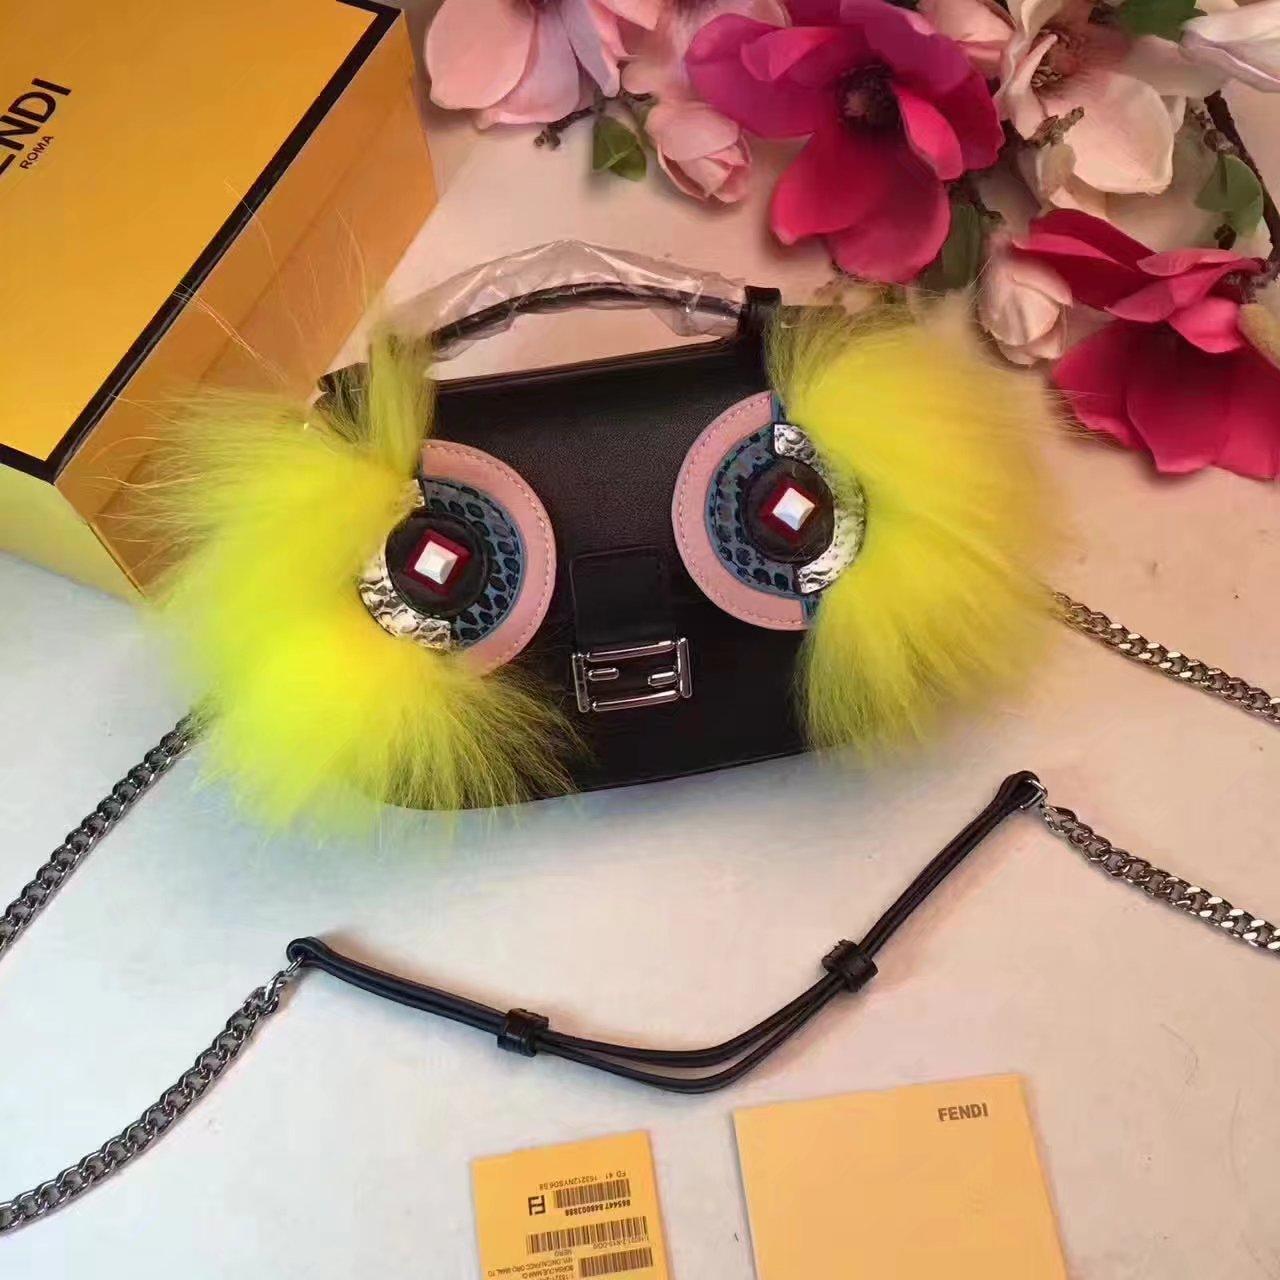 Fendi Baguette Micro Double-Sided Monster Crossbody Bag Yellow